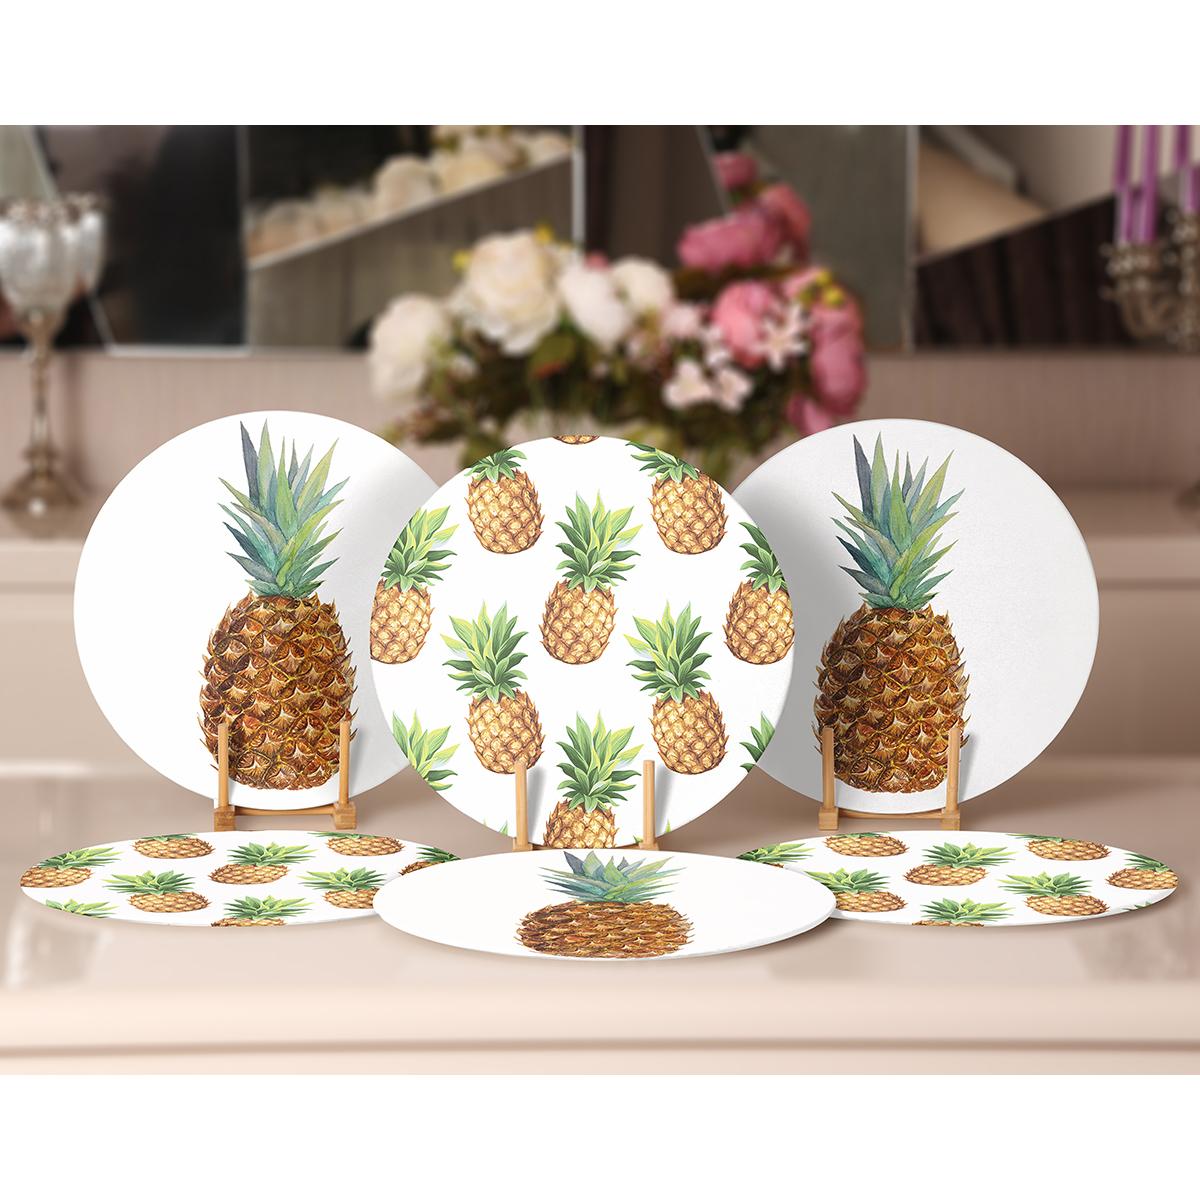 6'lı Beyaz Zeminde Ananas Desenli Servis Altlığı & Supla Realhomes